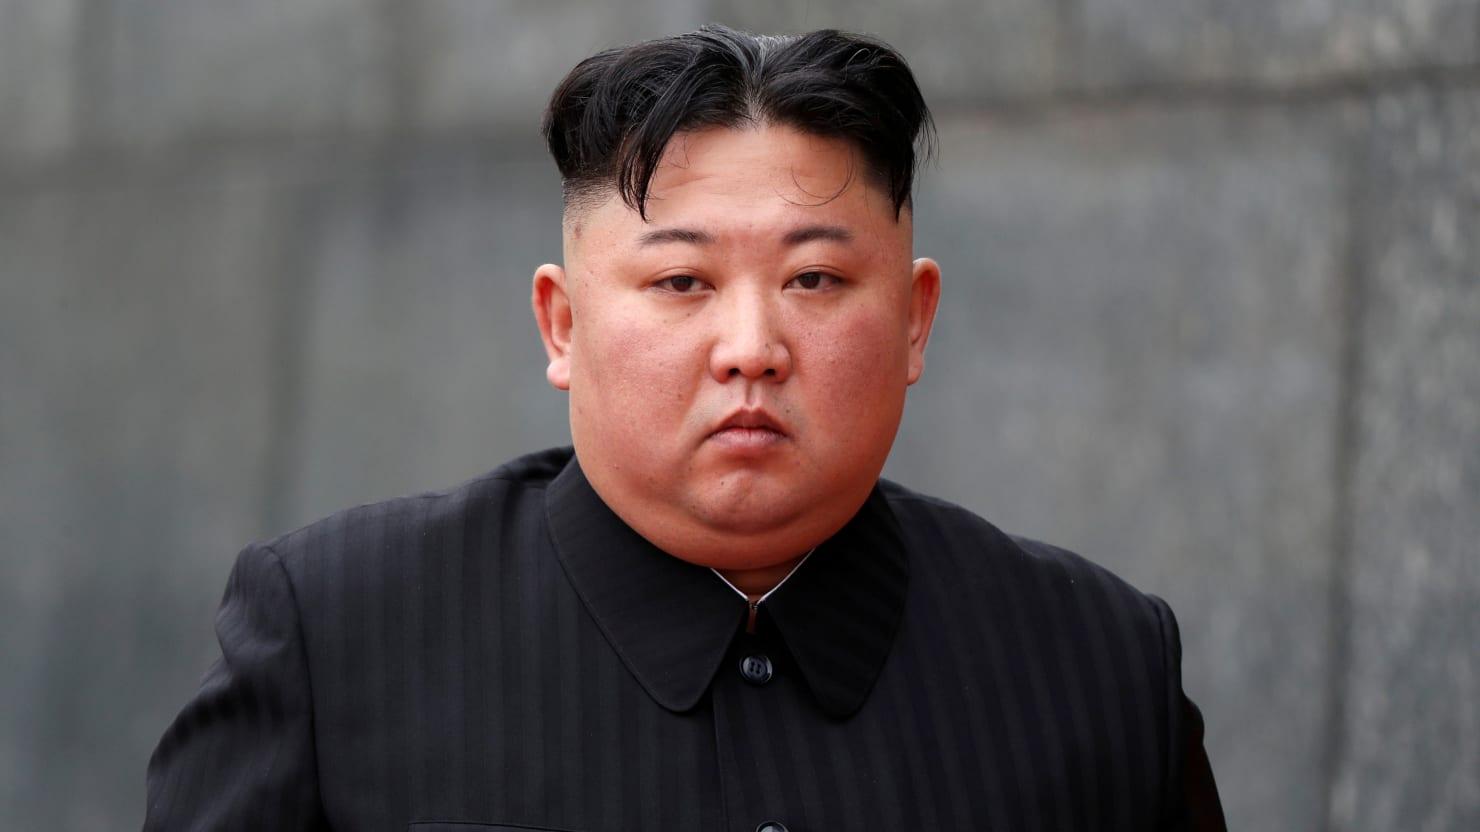 North Korean Leader Kim Jong Un, Russian President Vladimir Putin to Meet in April